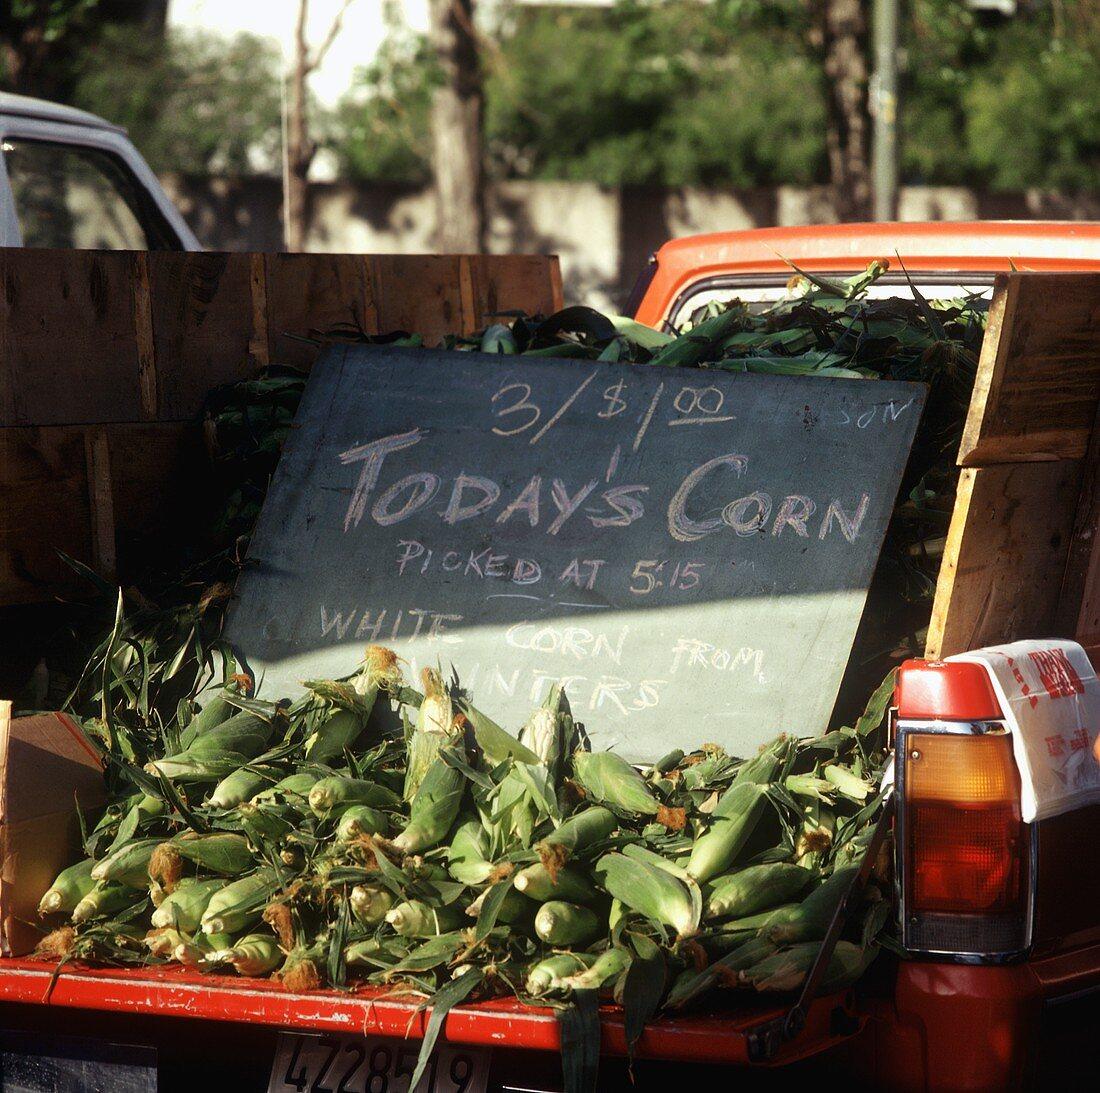 Frisch gepflückter Mais auf Ladefläche eines Autos (USA)